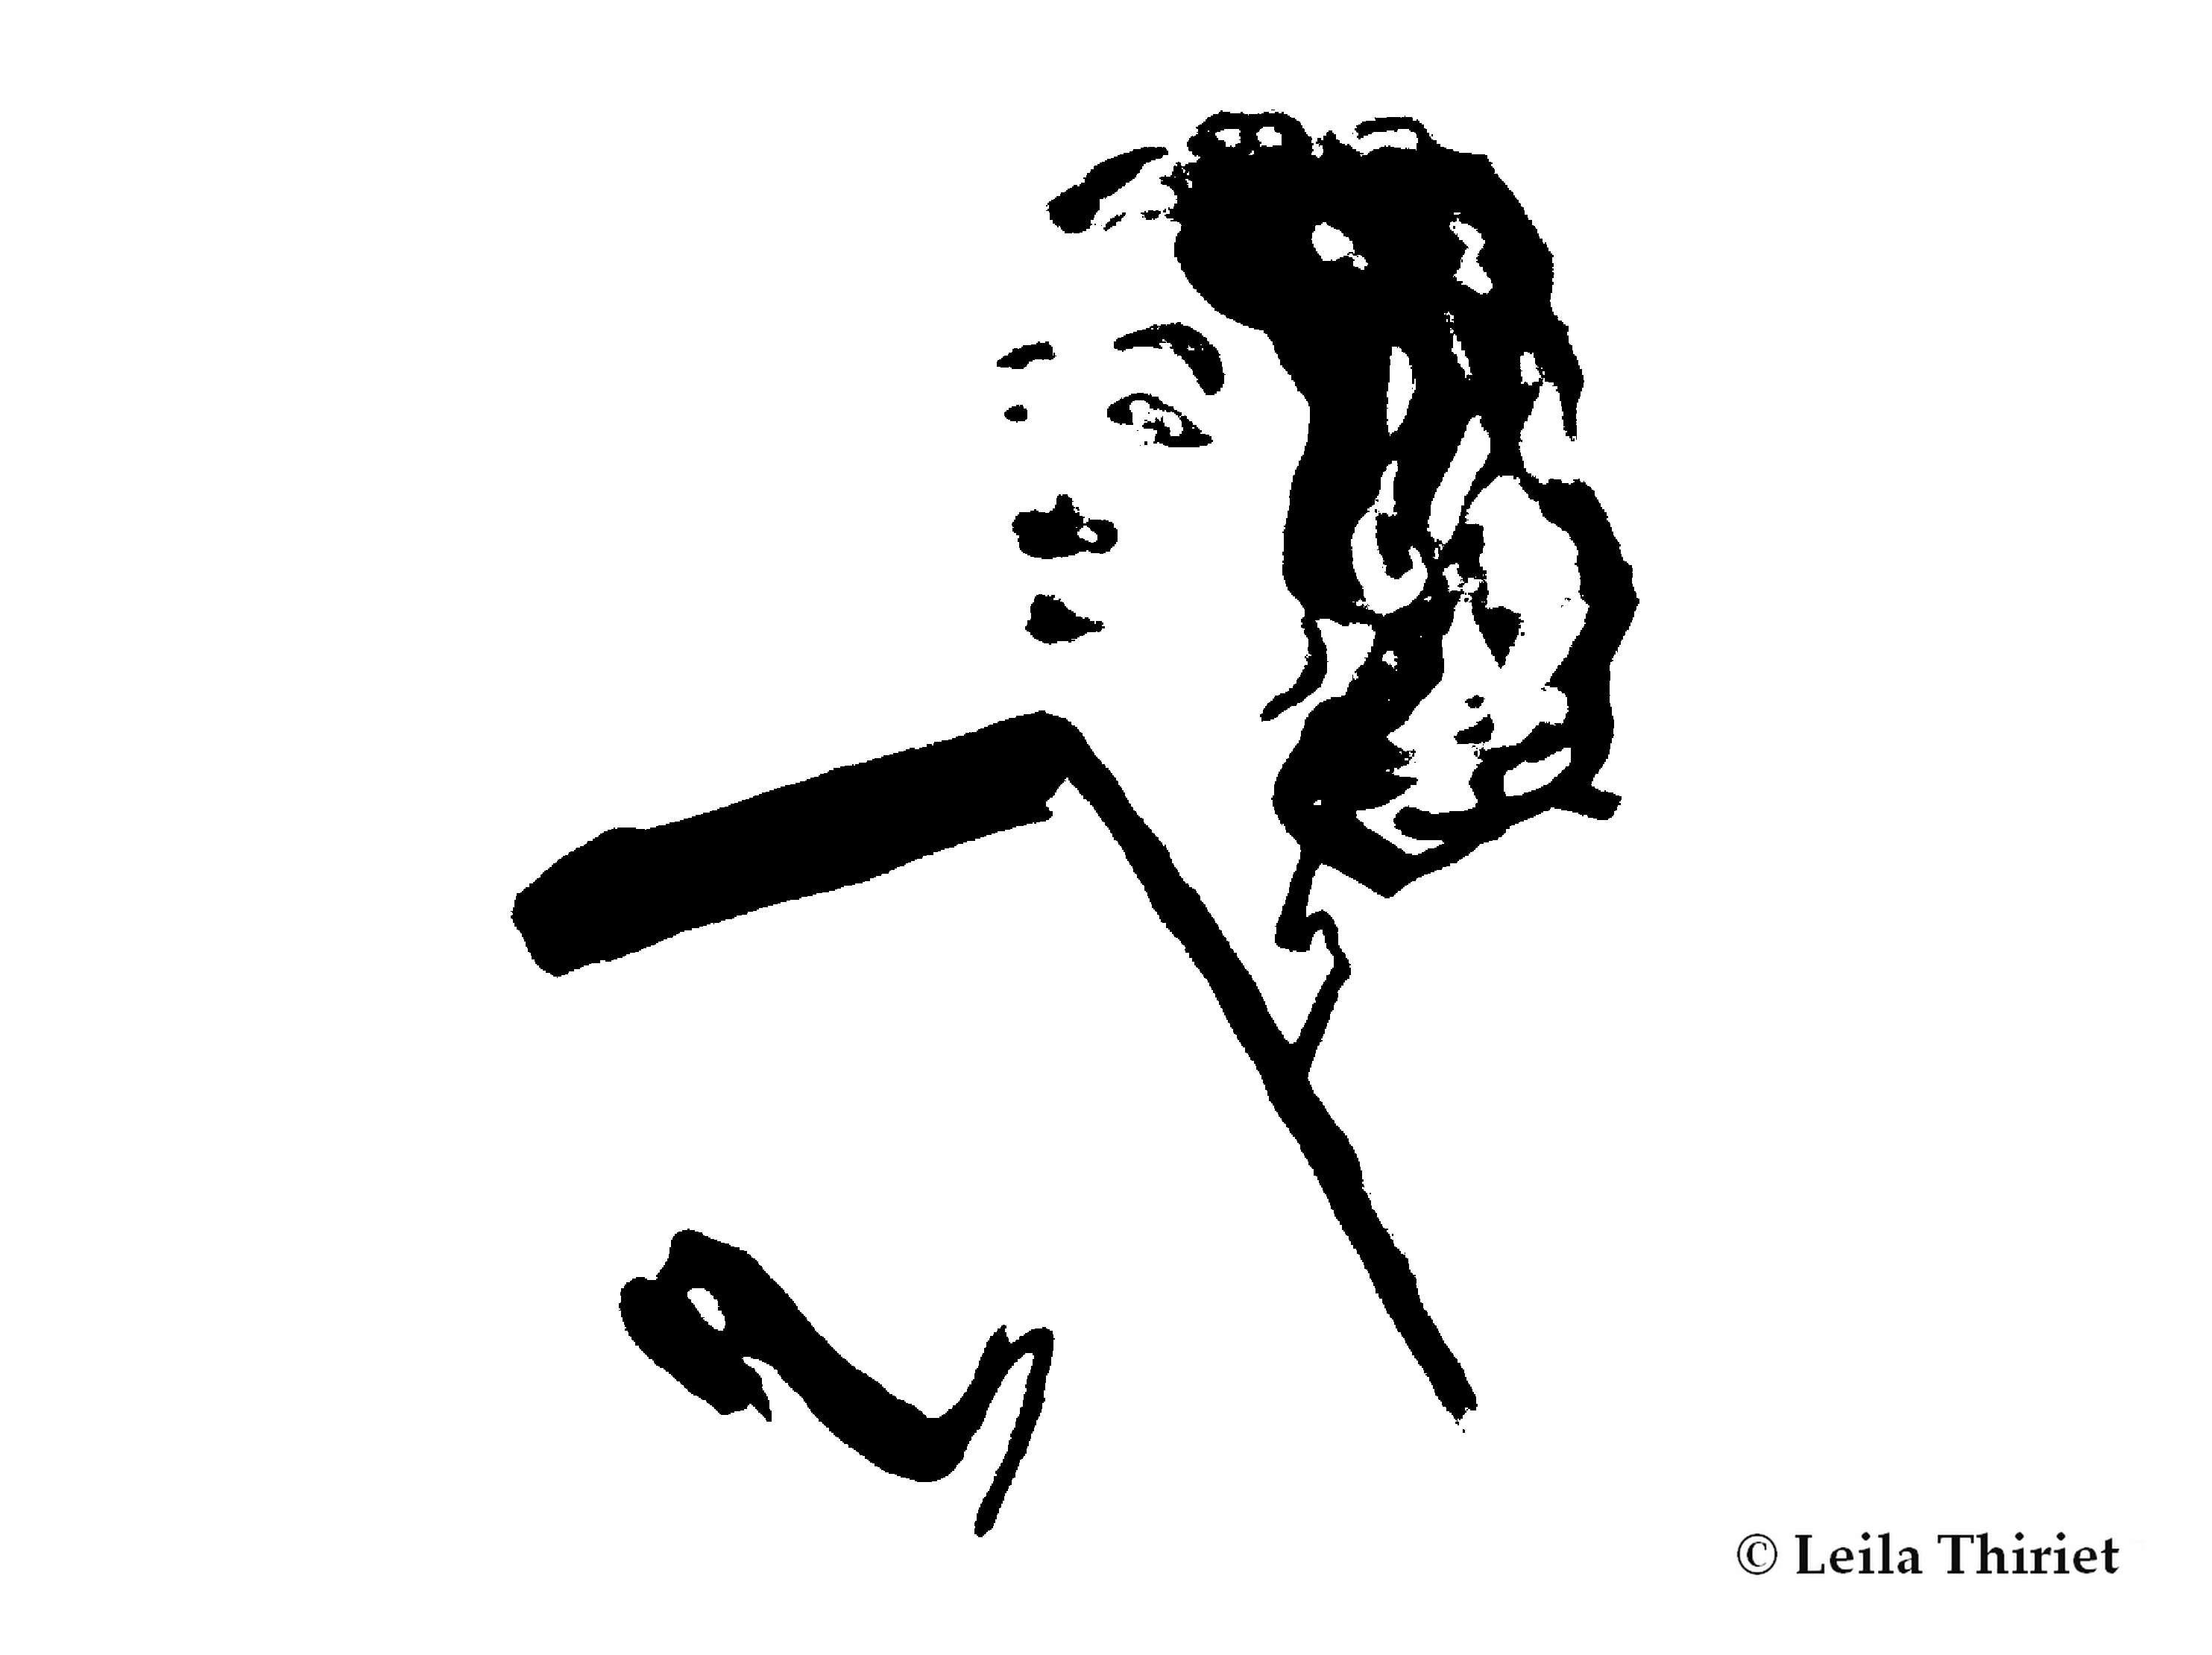 08'-©Leïla Thiriet